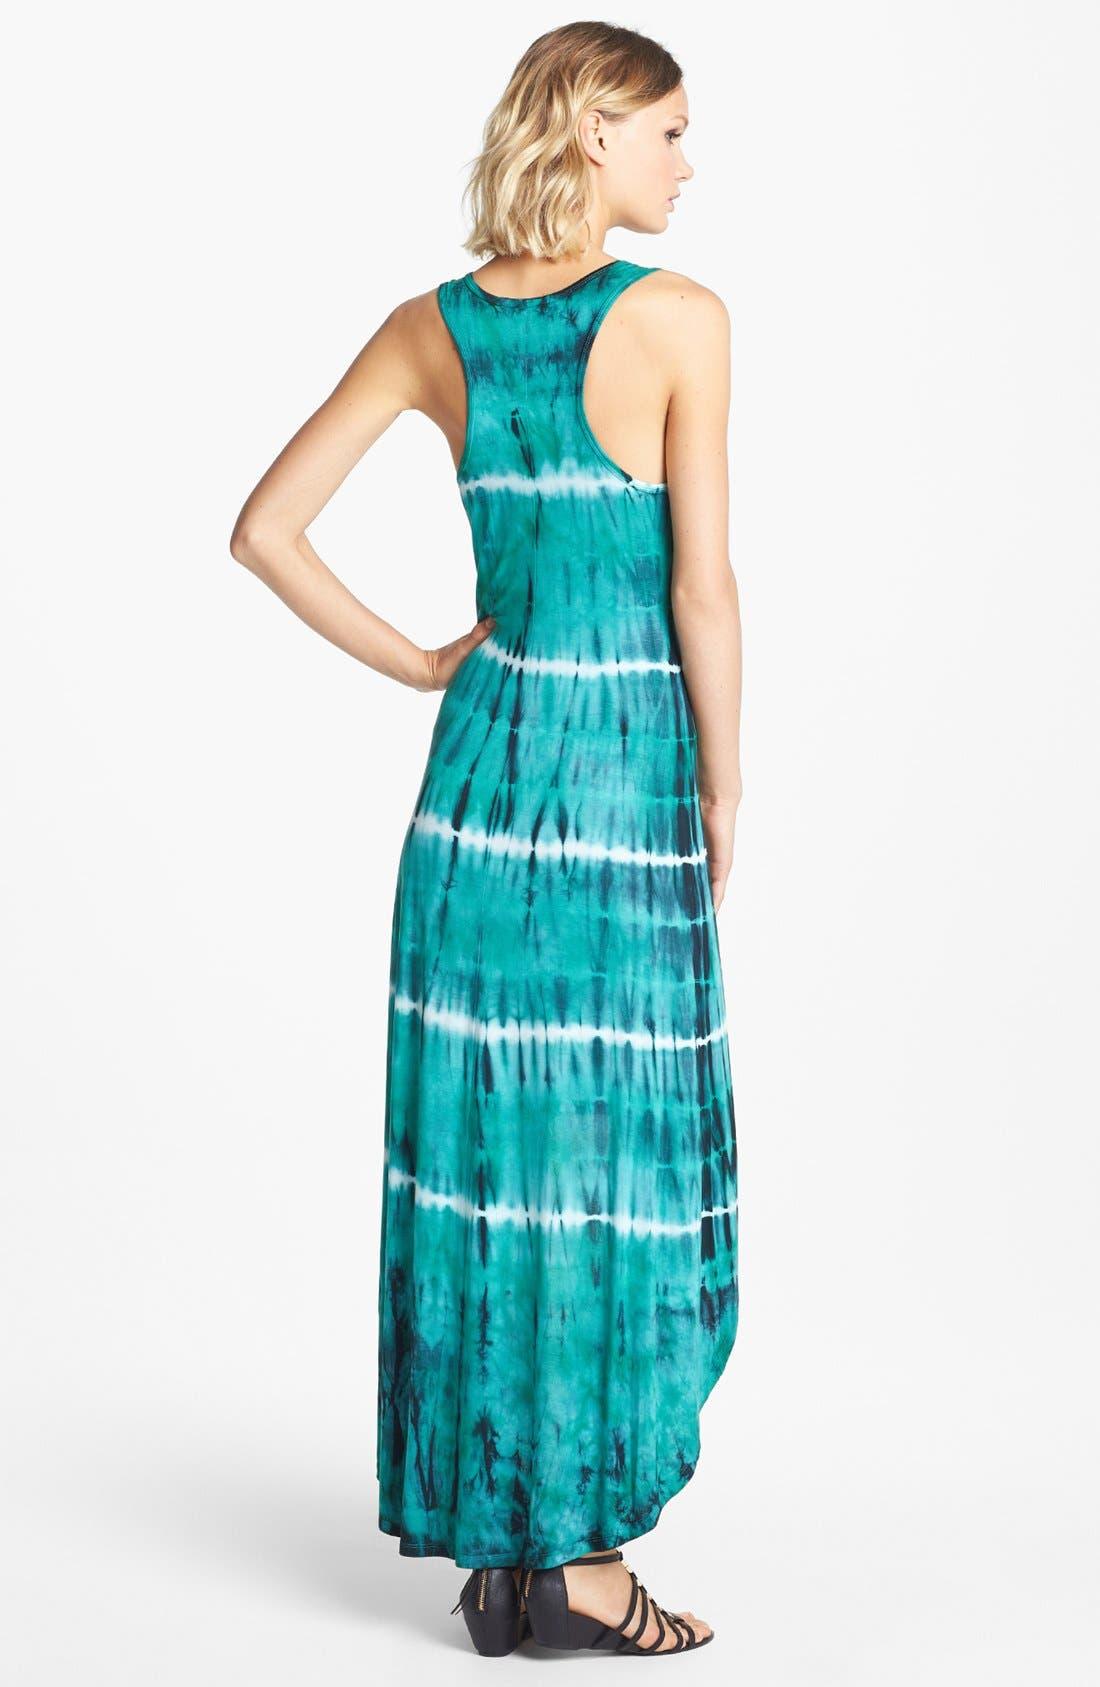 'Ivy' Tie Dye Maxi Dress,                             Alternate thumbnail 3, color,                             319